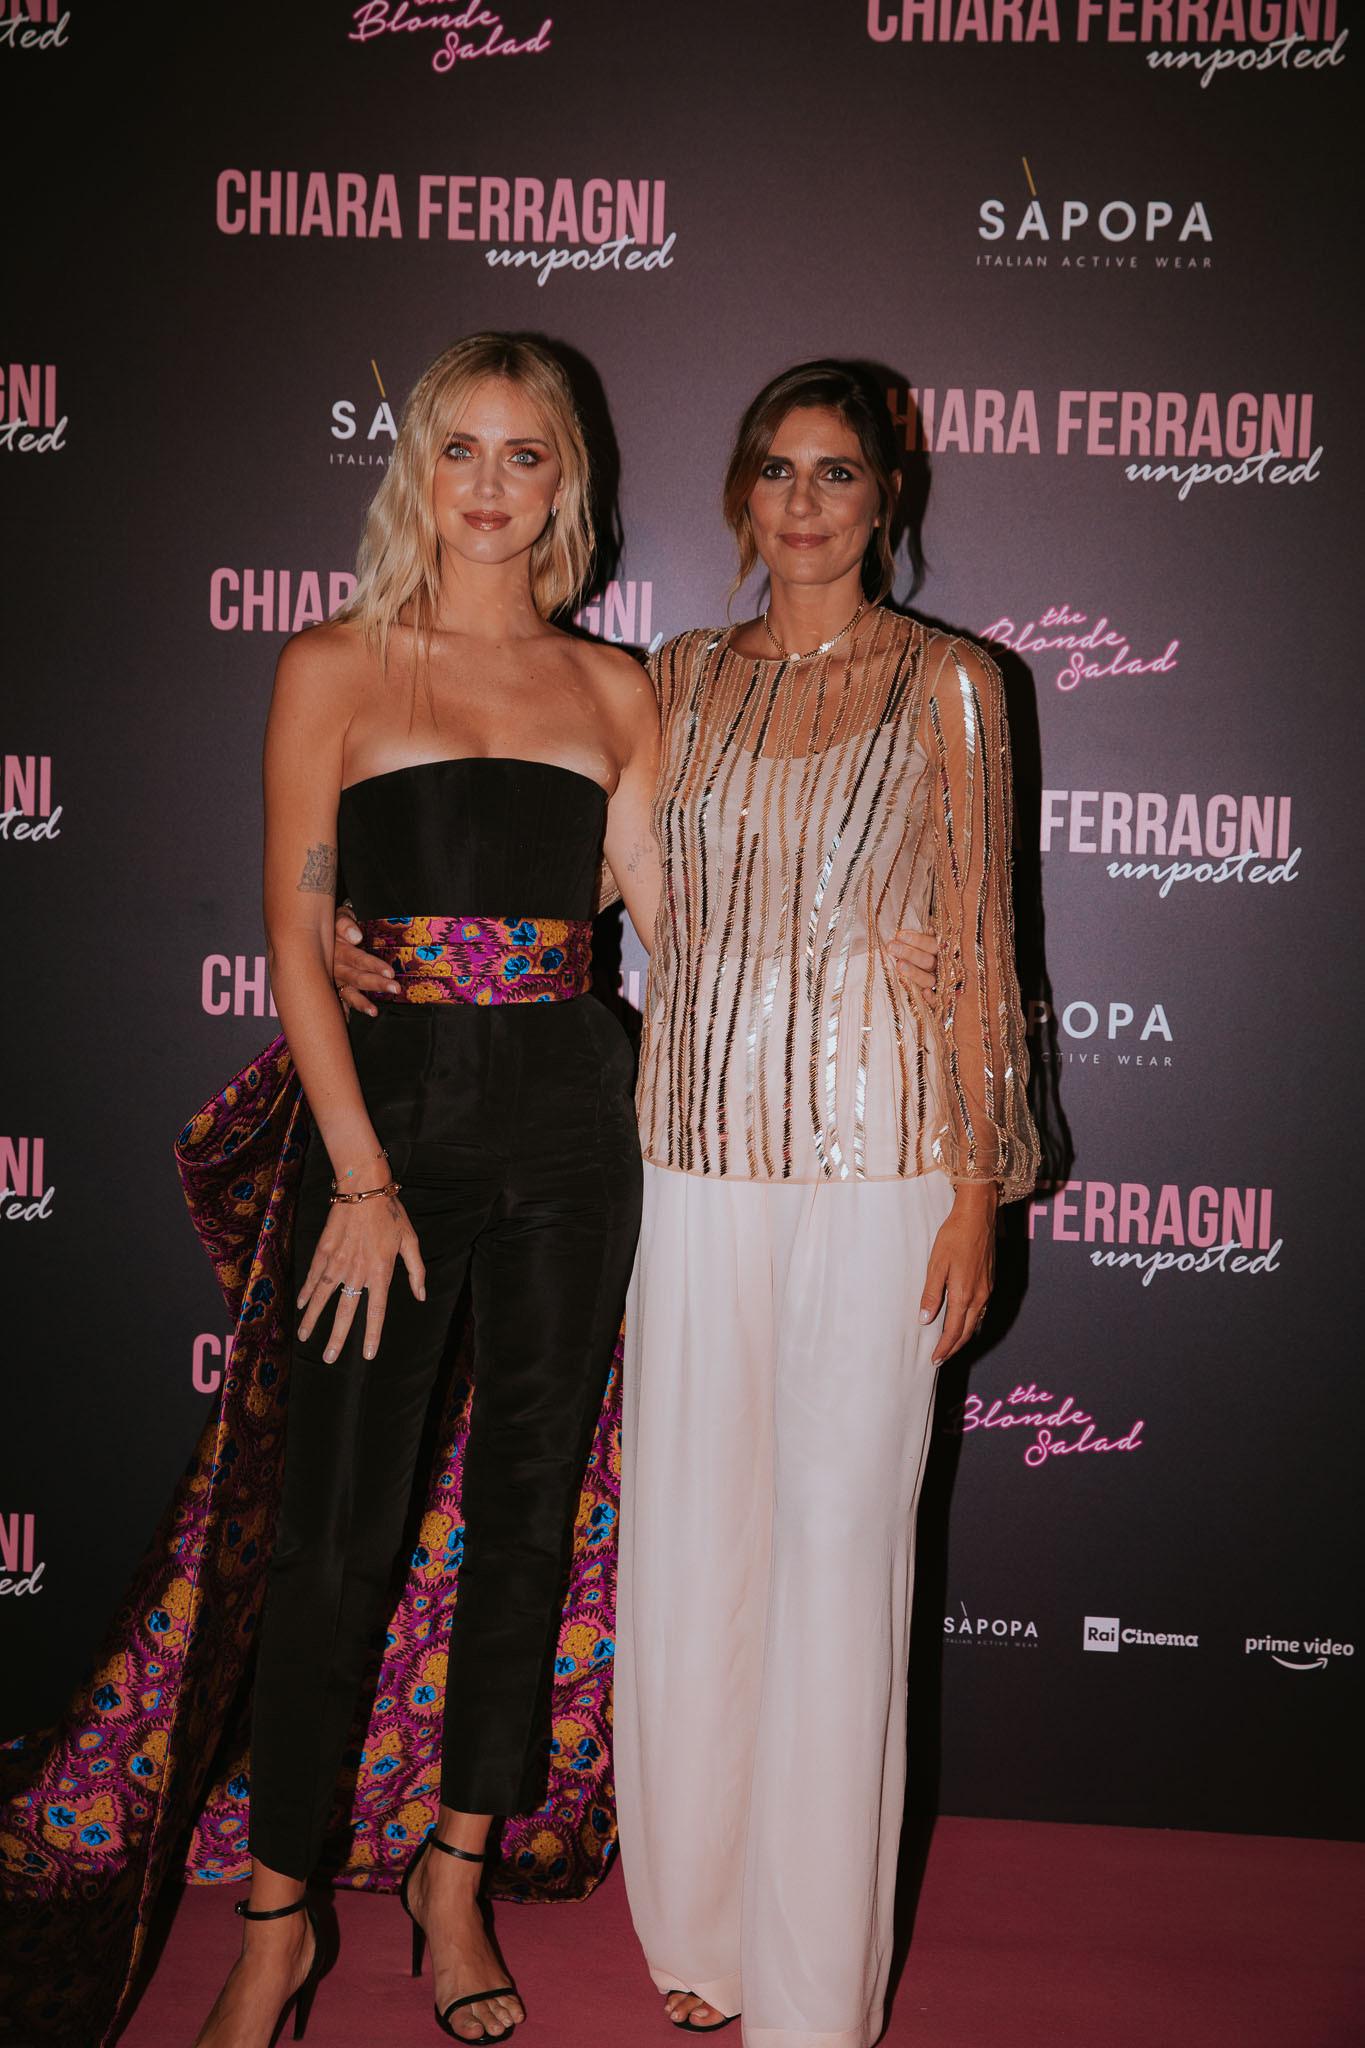 Chiara Ferragni e Elisa Amoruso